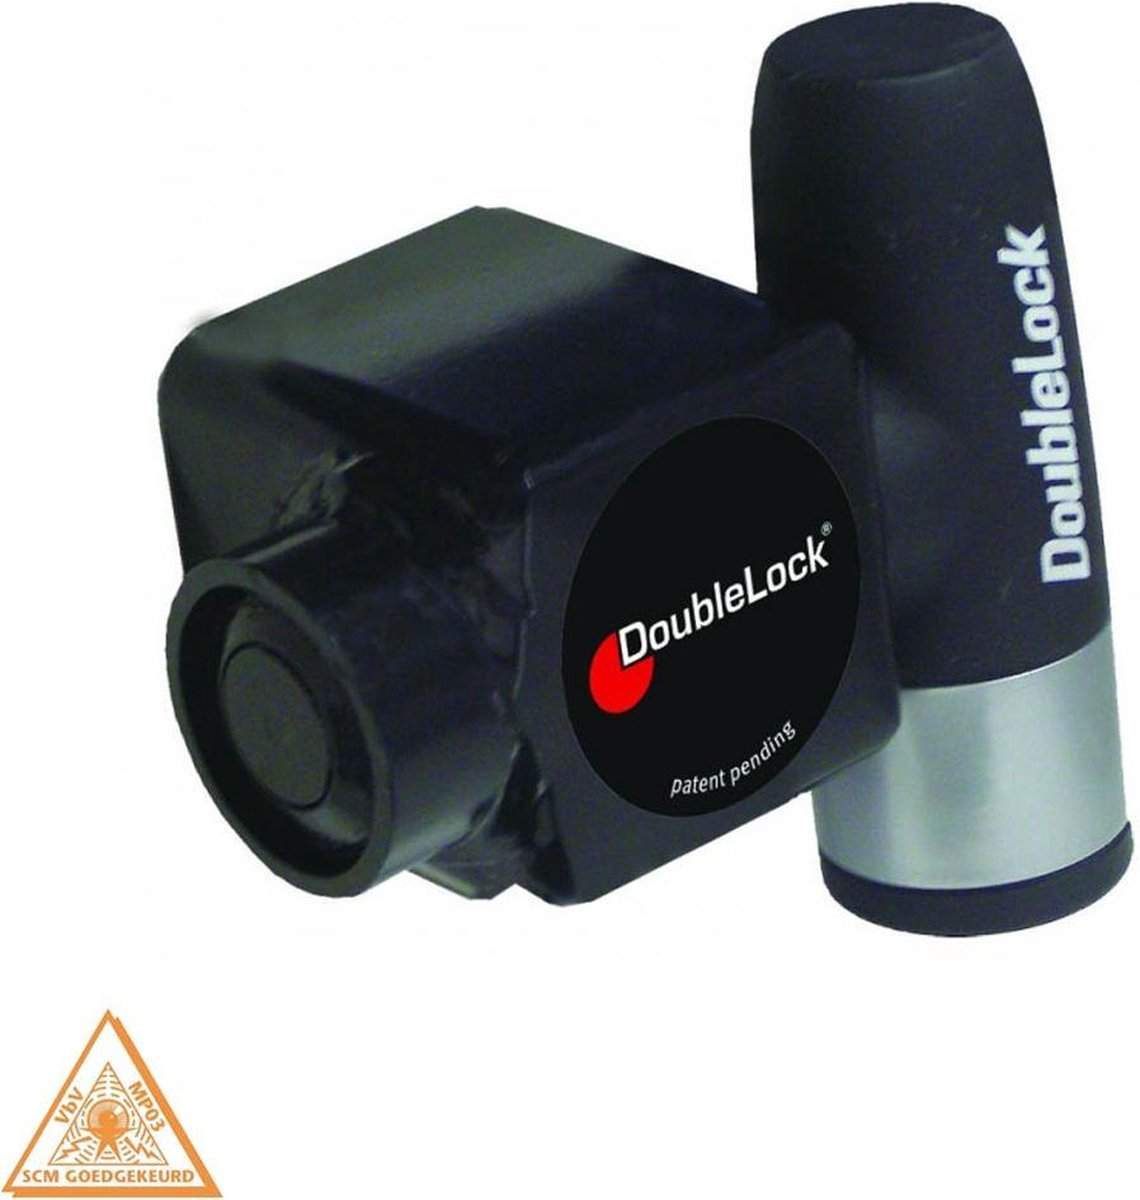 Doublelock Outboard Lock Buitenboordmotorslot Boutbevestiging - SCM